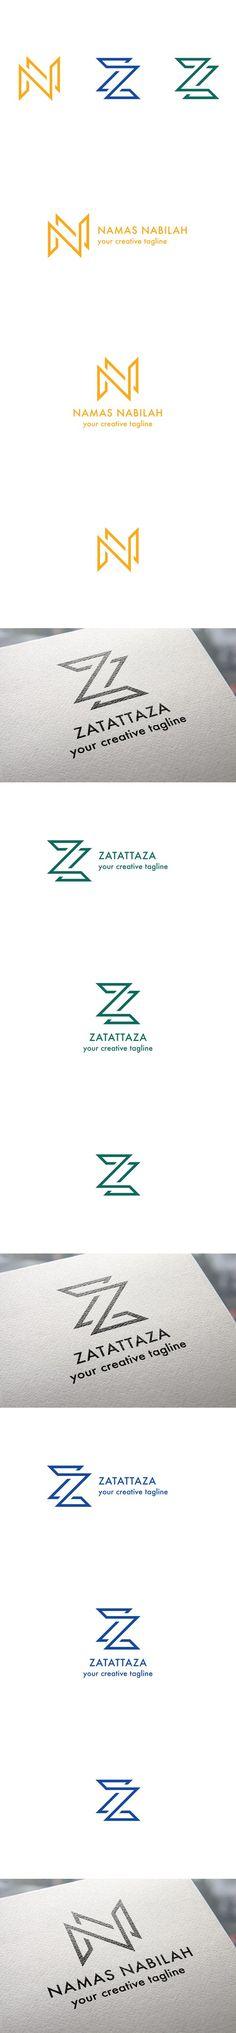 N Logo / Z Logo. Logo Templates. $29.00